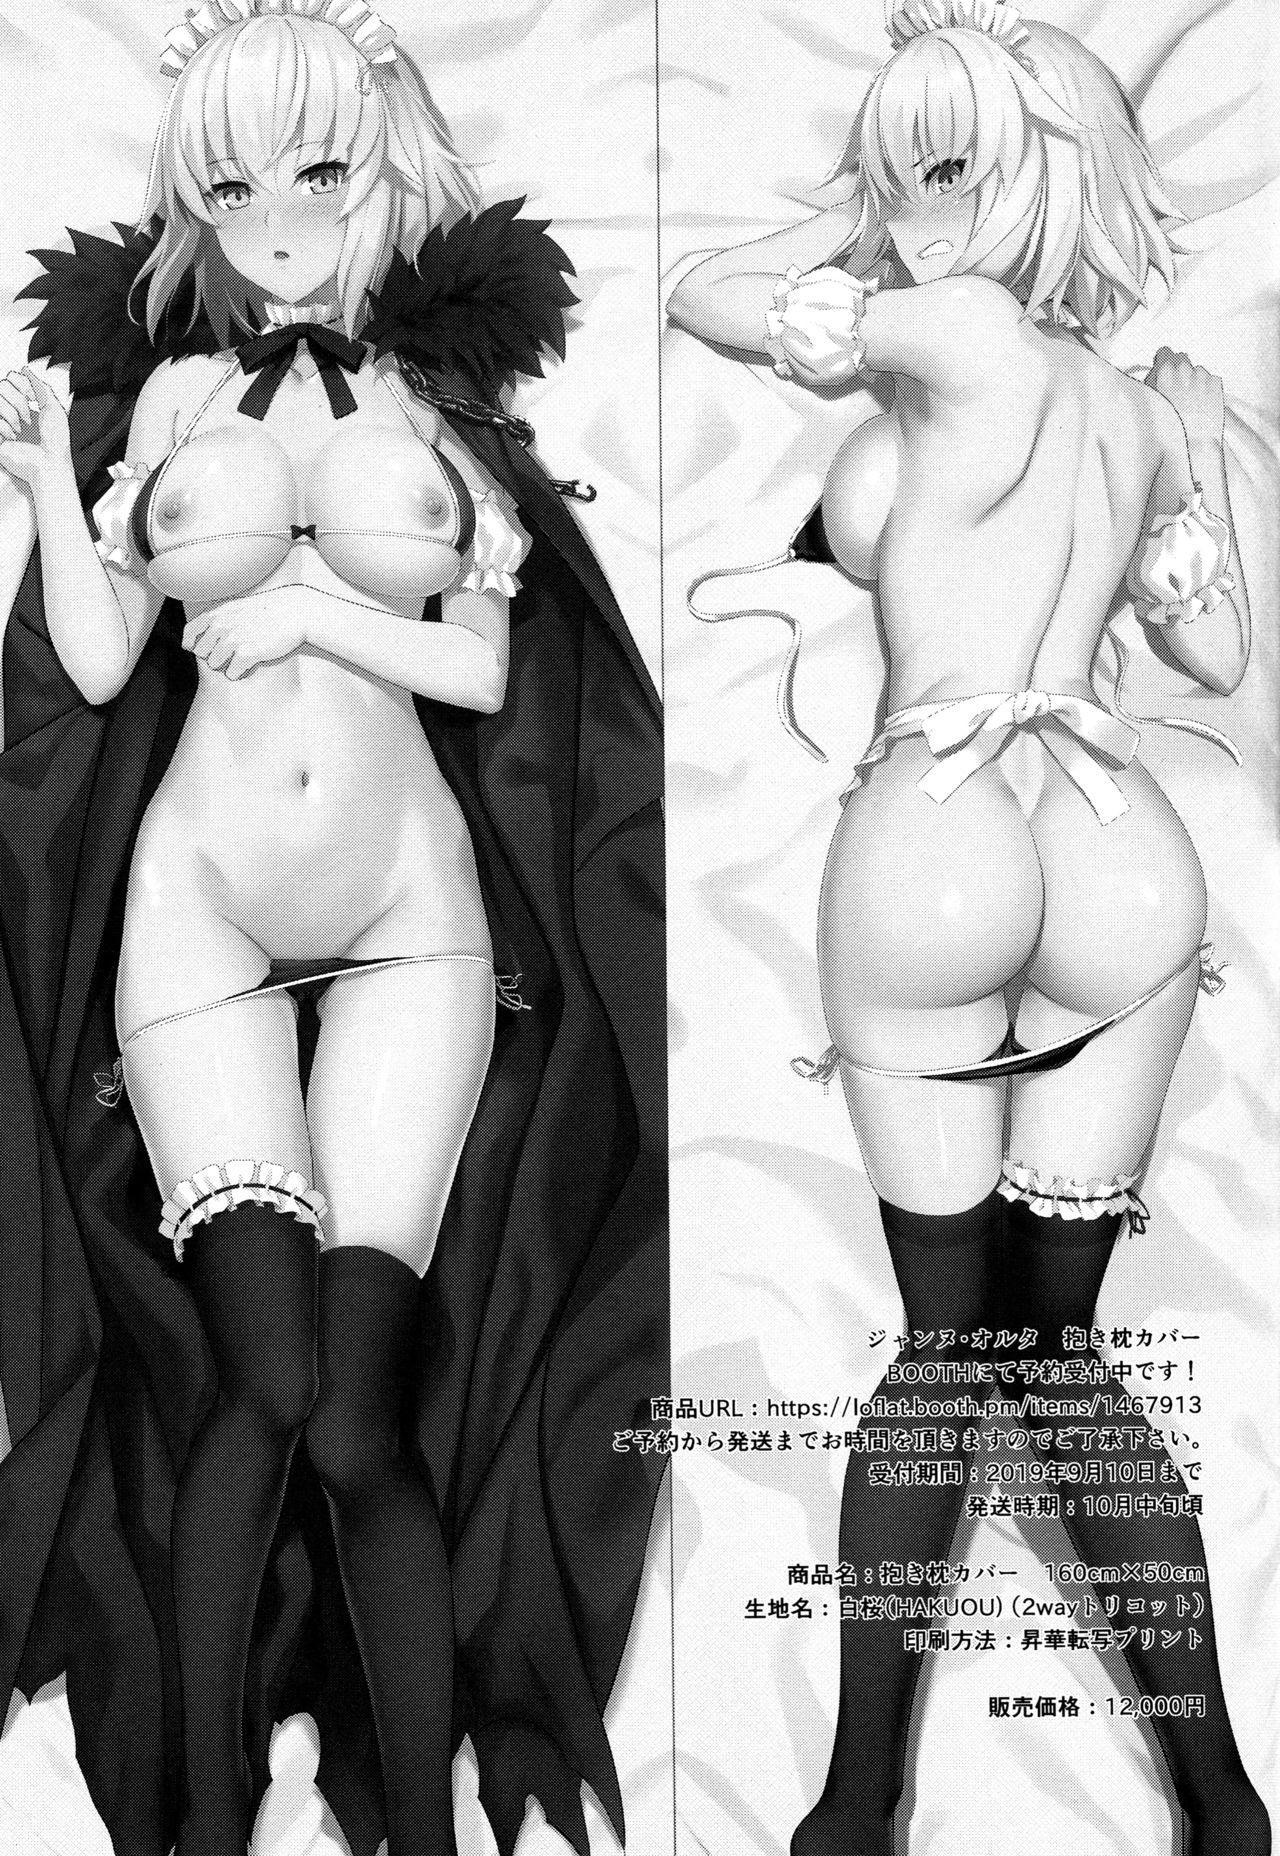 Chaldea Soap 2 Iinari Tsundere Gohoushi Maid 18